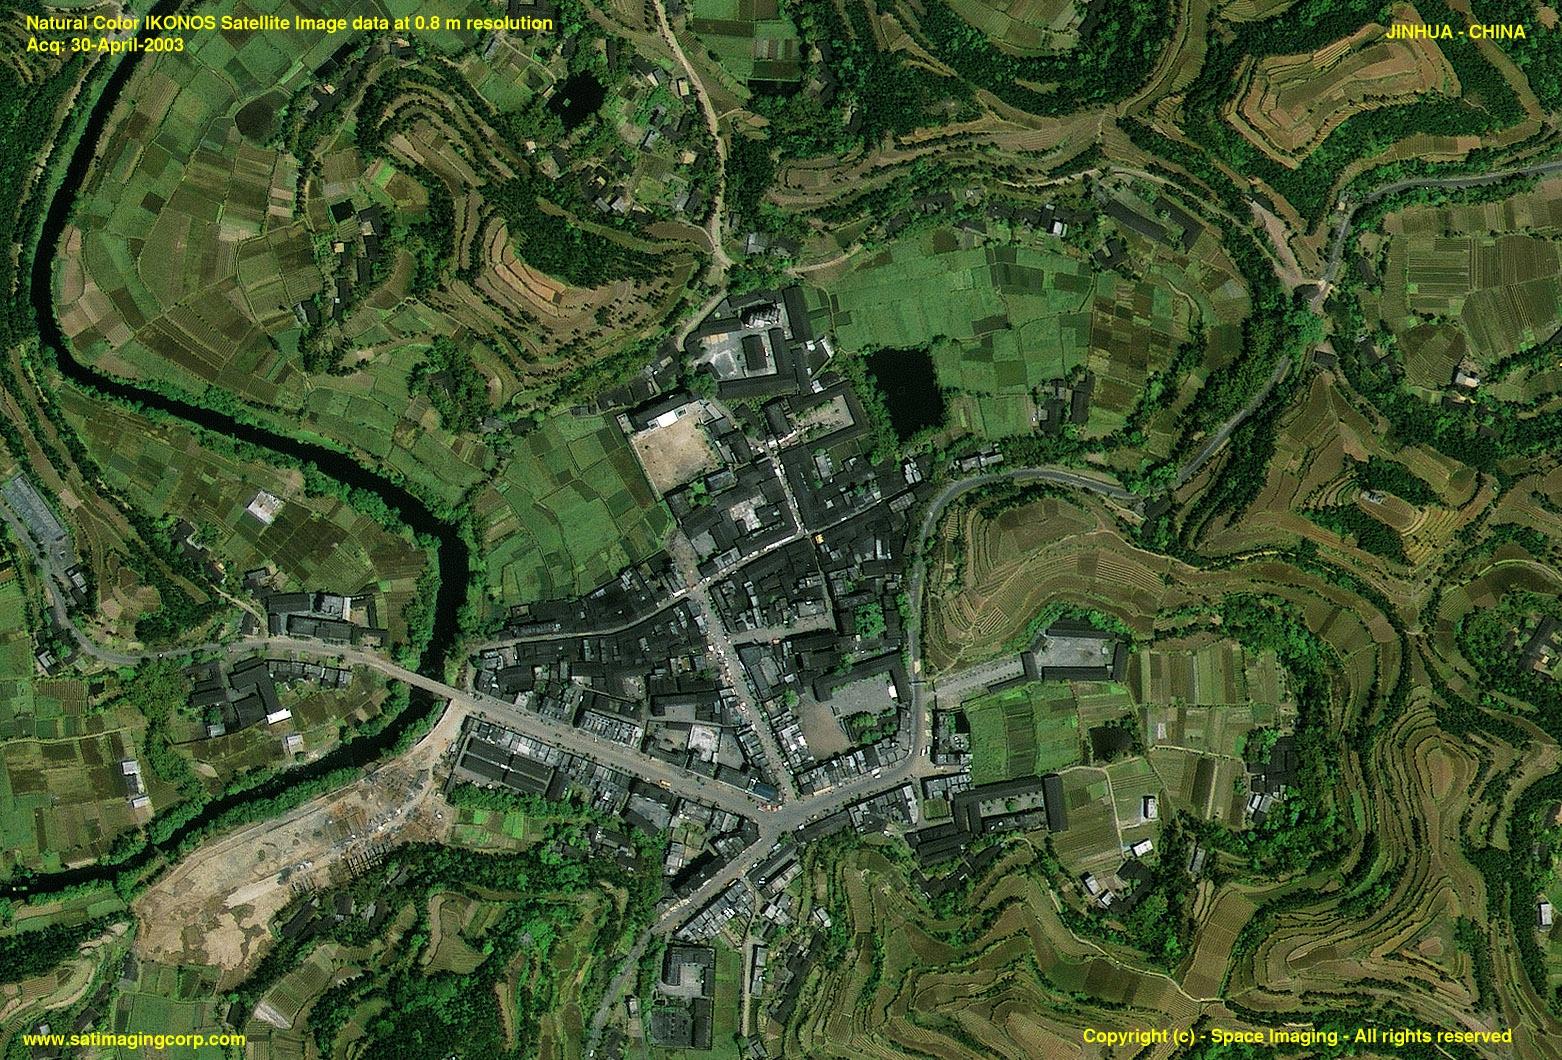 Jinhua China  City pictures : IKONOS Satellite Image of Jinhua, China | Satellite Imaging Corp